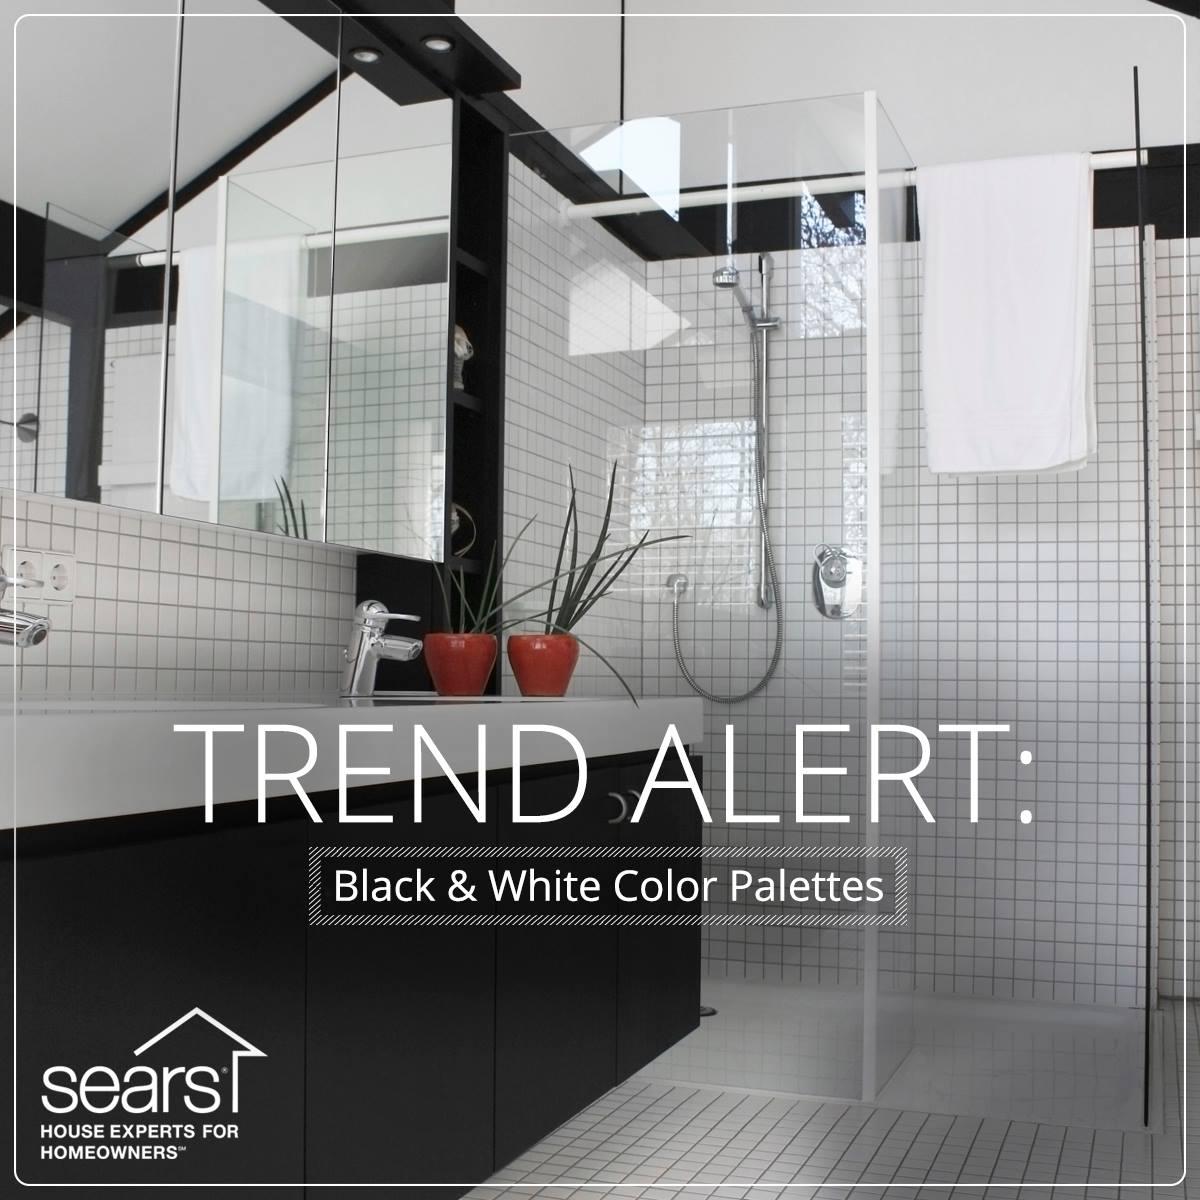 sears bathroom remodel sears kitchen remodel Kitchen Remodel Renovation Redesign Sears Home Services